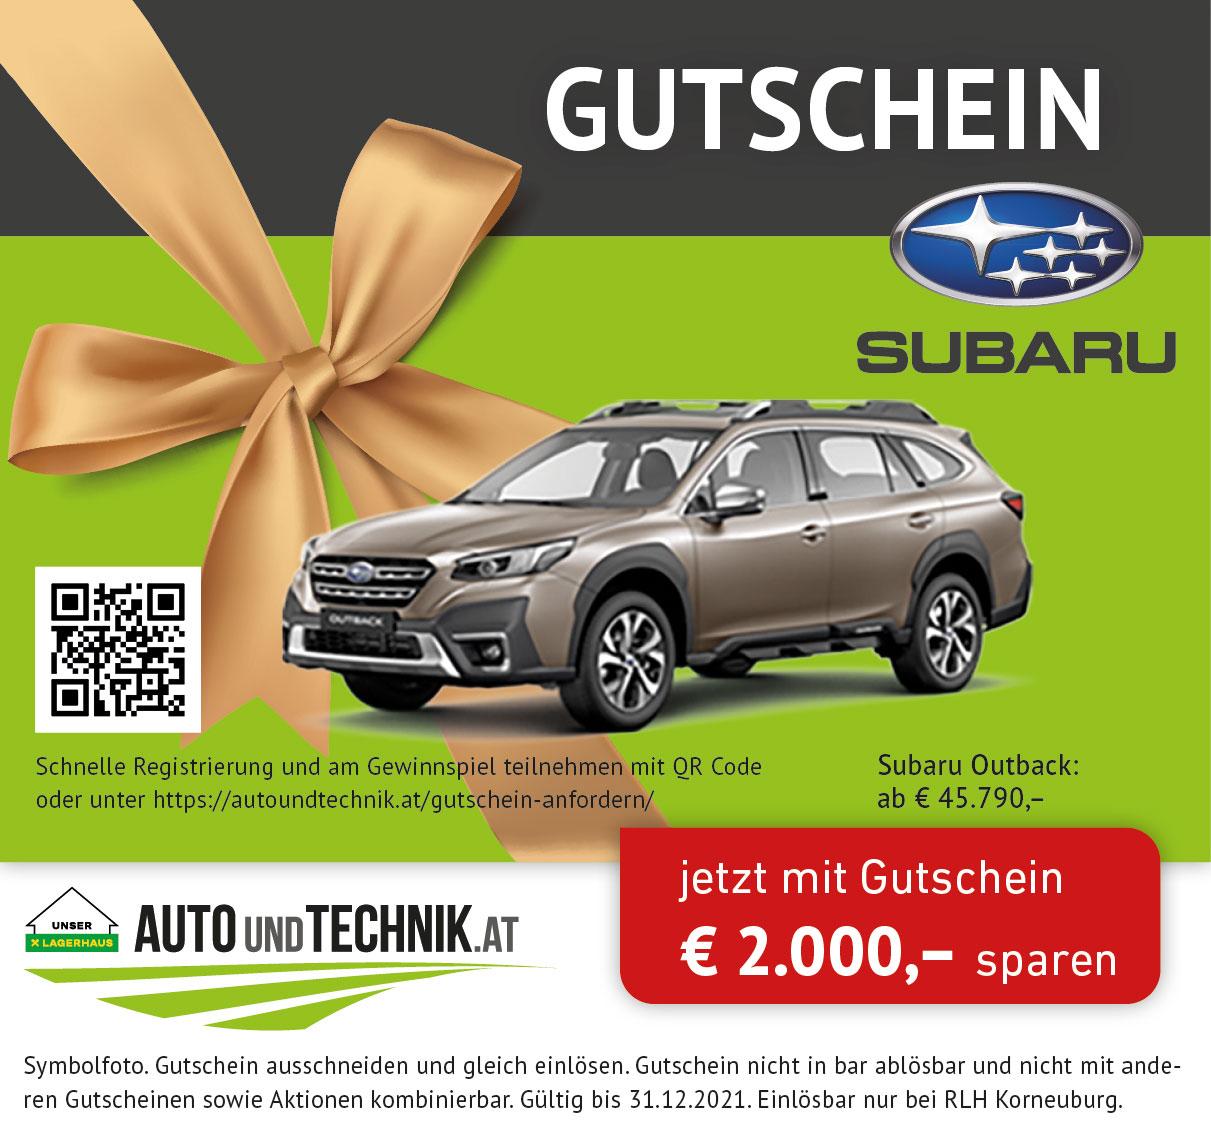 Gutschein-Subaru-Outback-image-01